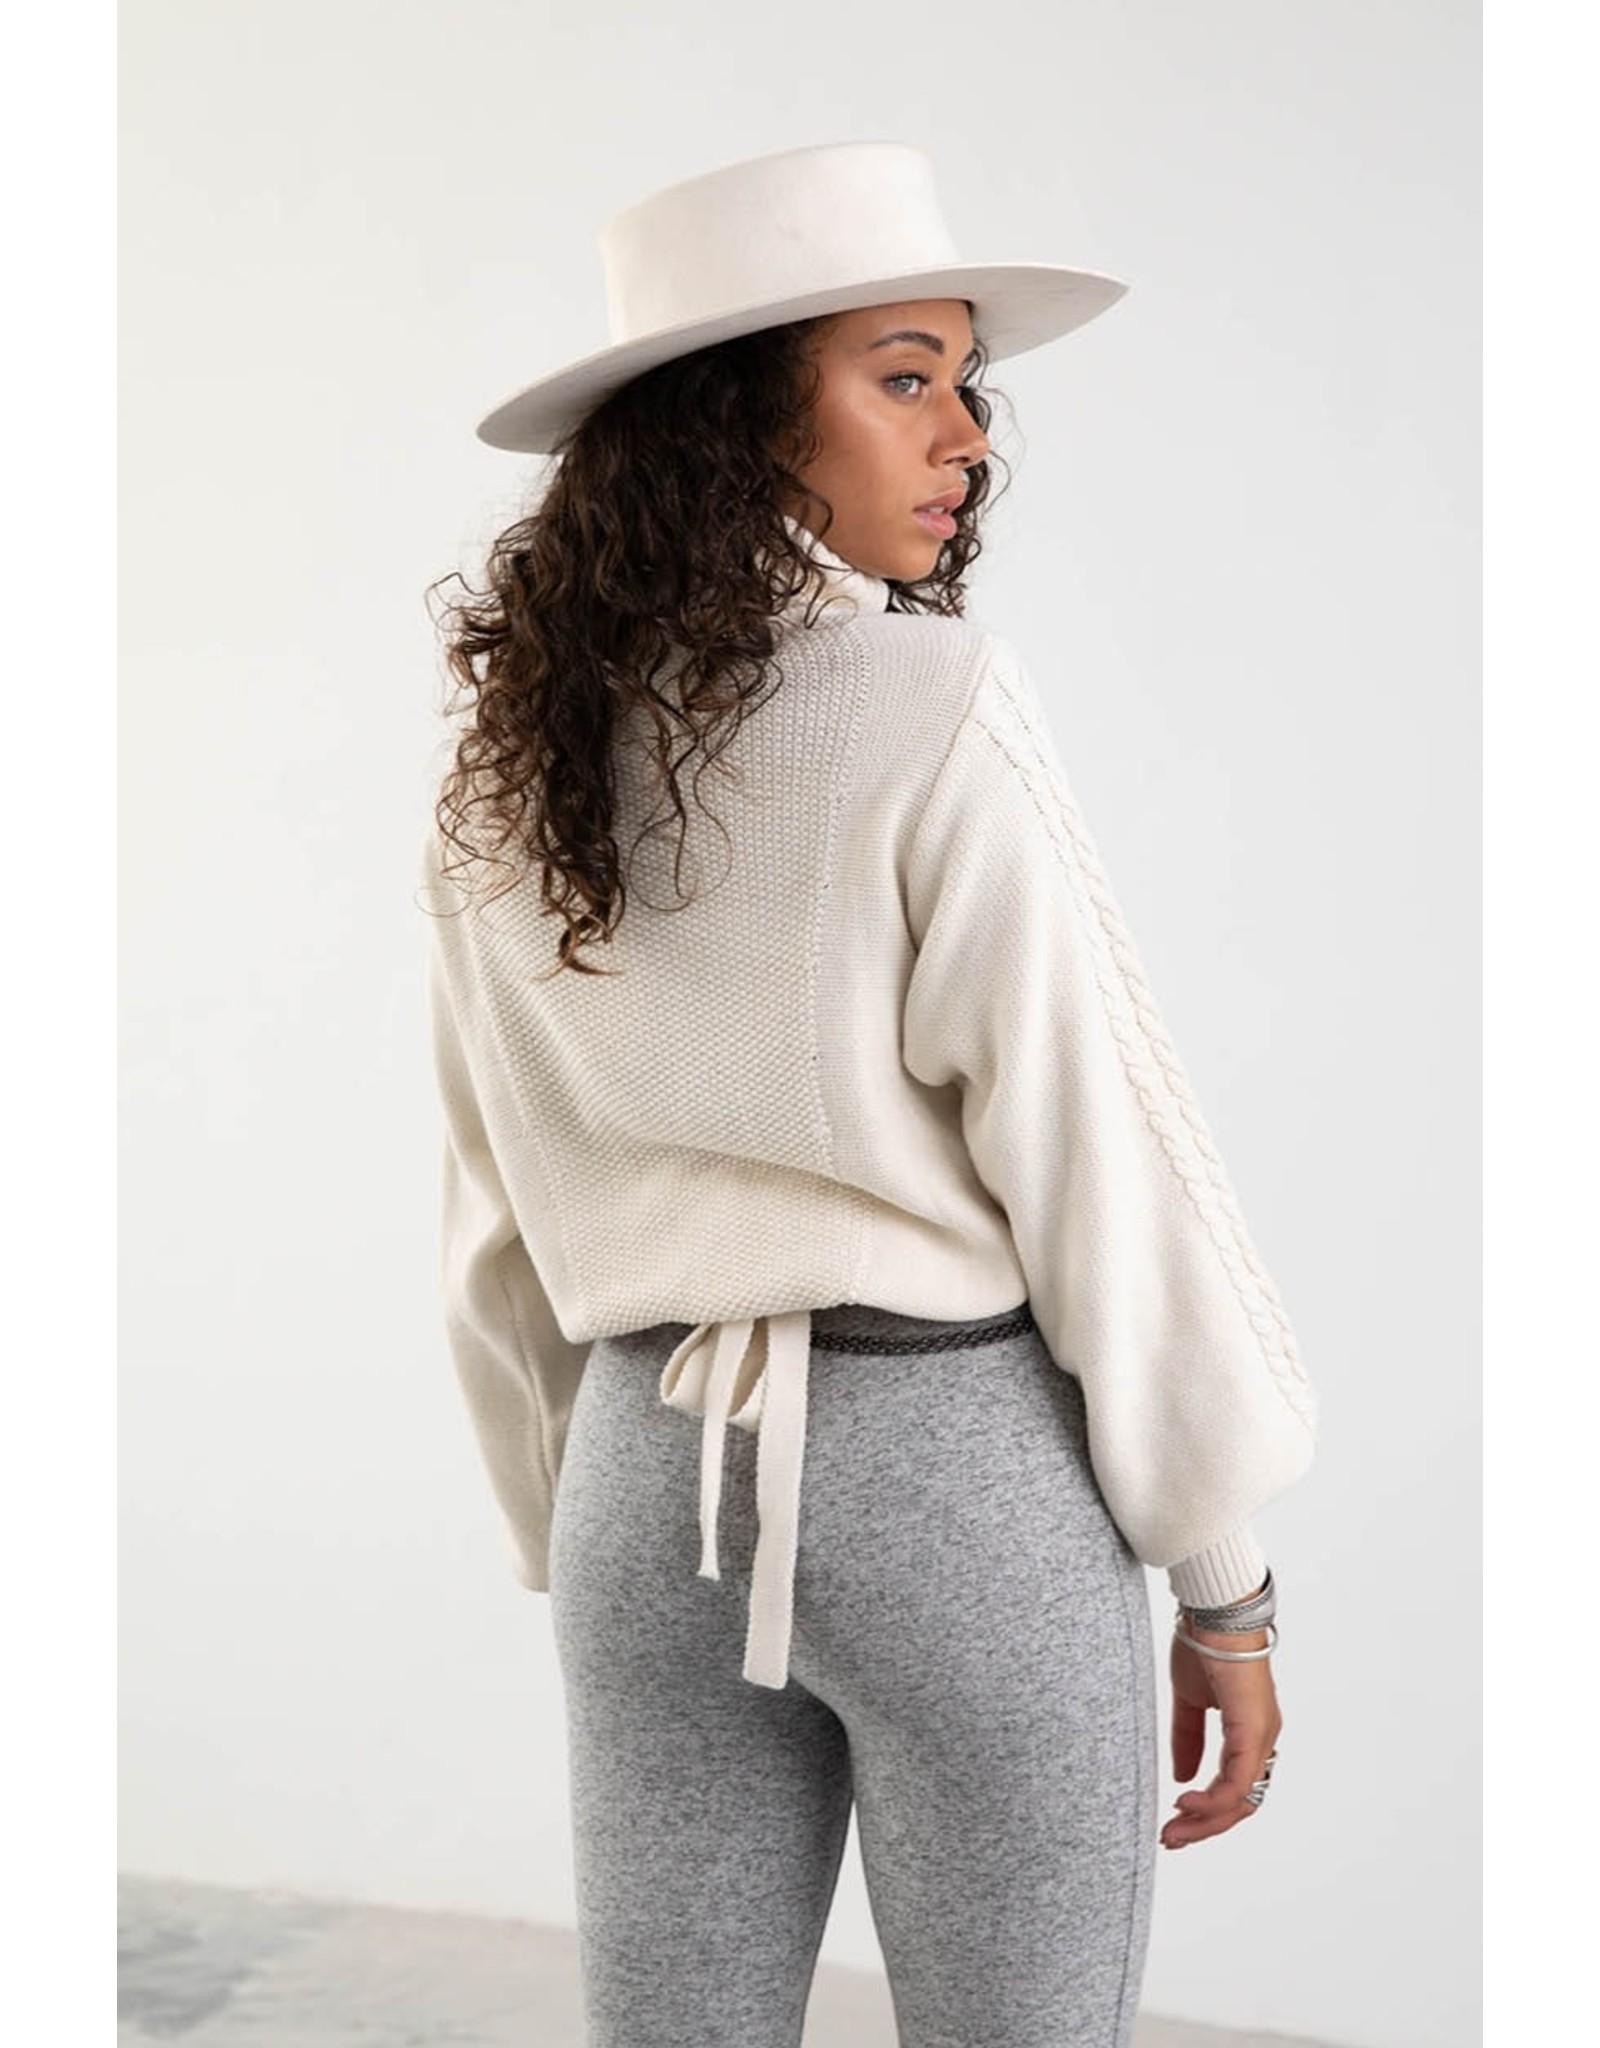 MW Ziva Knitted Sweater - Off White